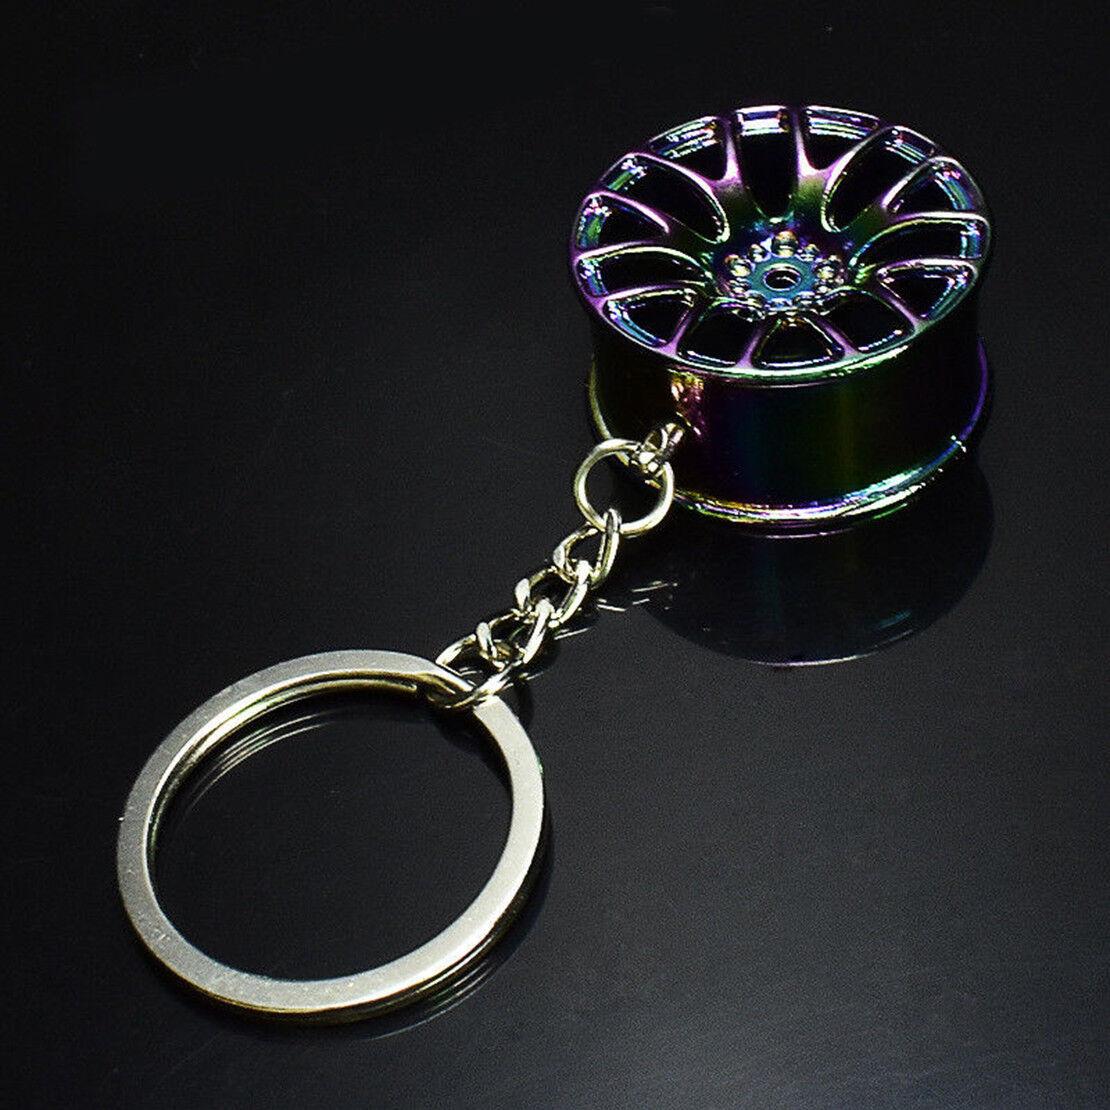 New Creative Wheel Hub Rim Model Man/'s Keychain Car Key Chain Cool Gift Hot